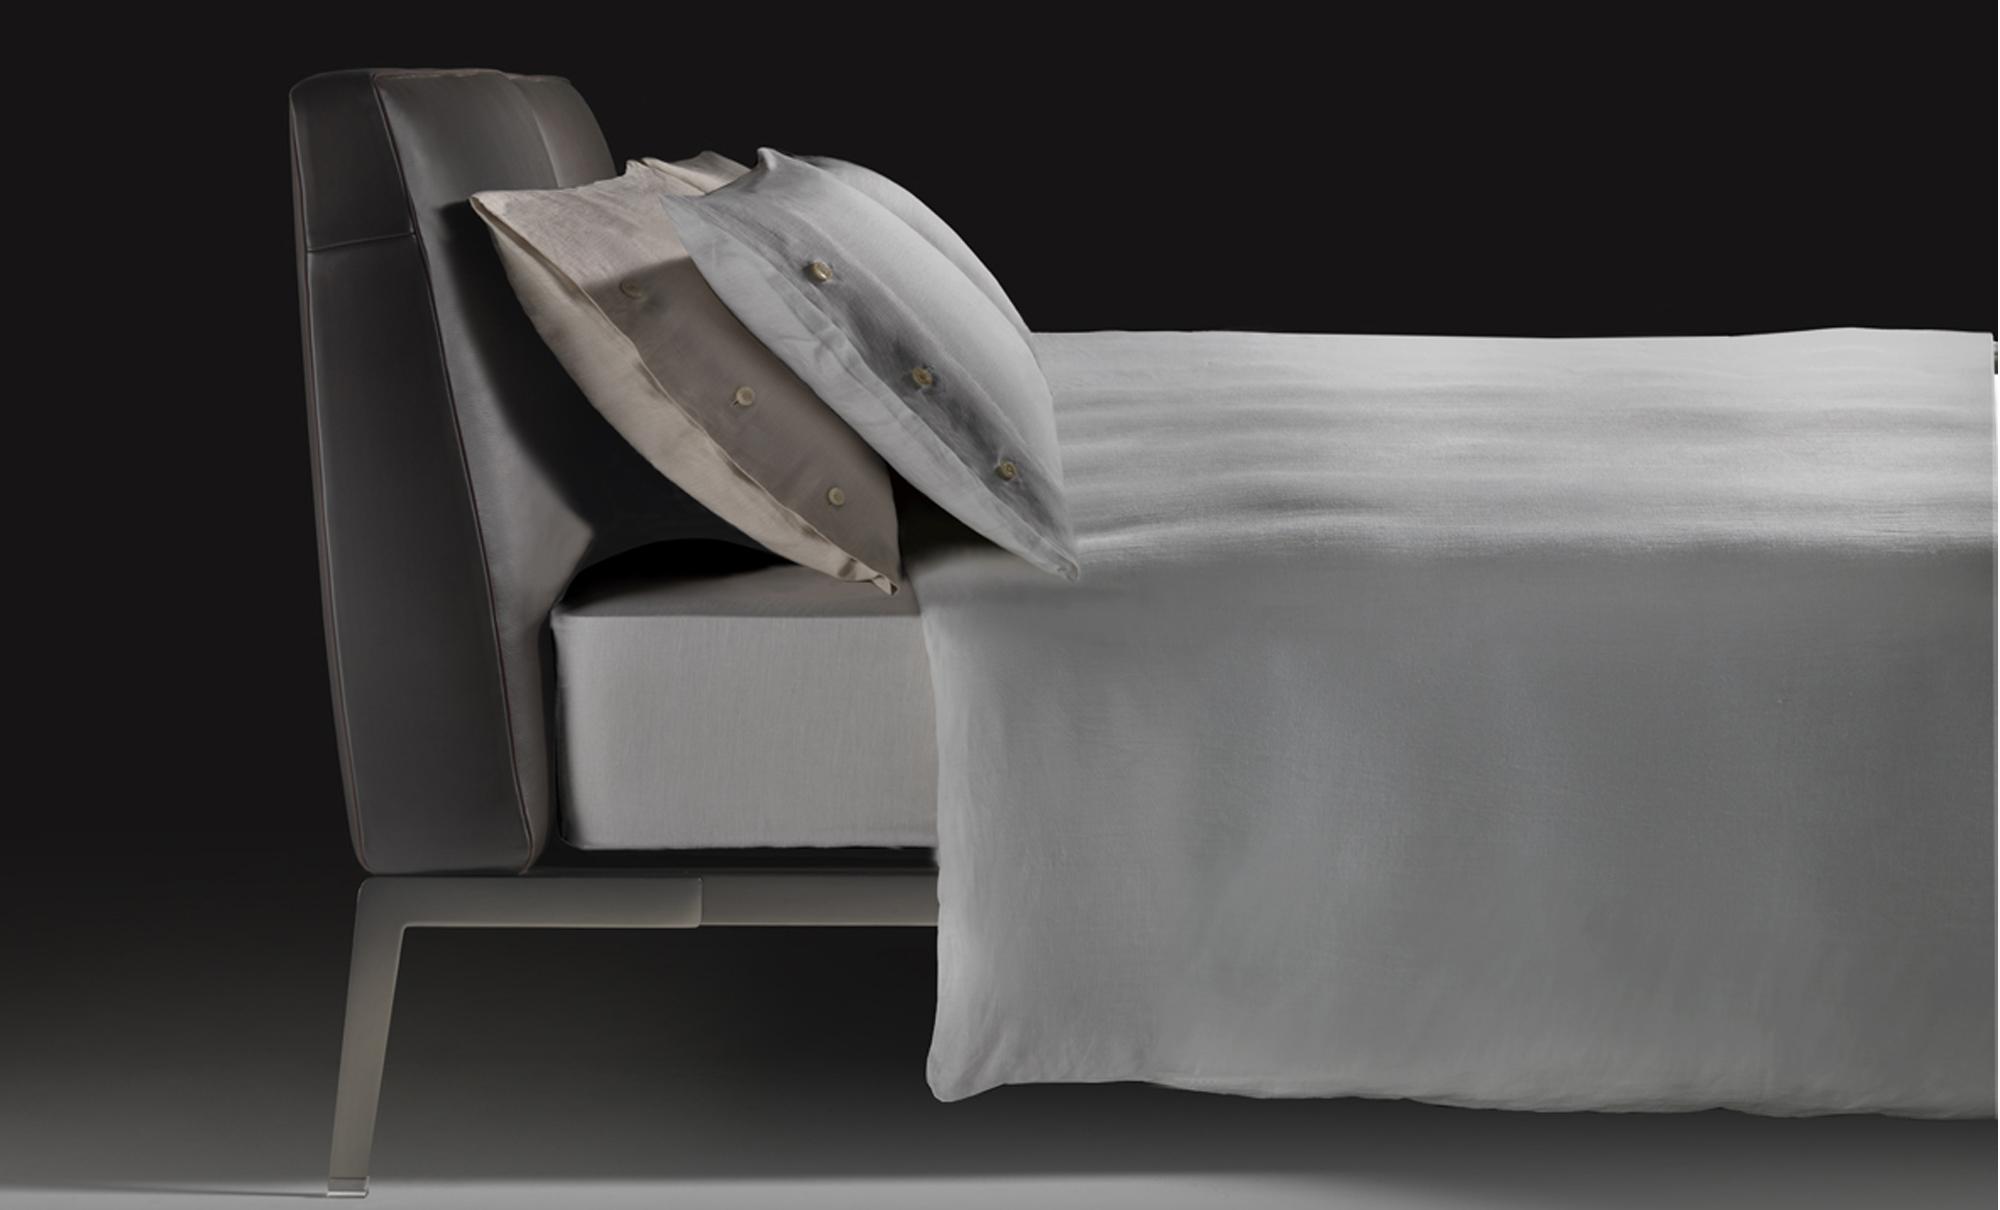 Lifesteel Bed Beds Fanuli Furniture